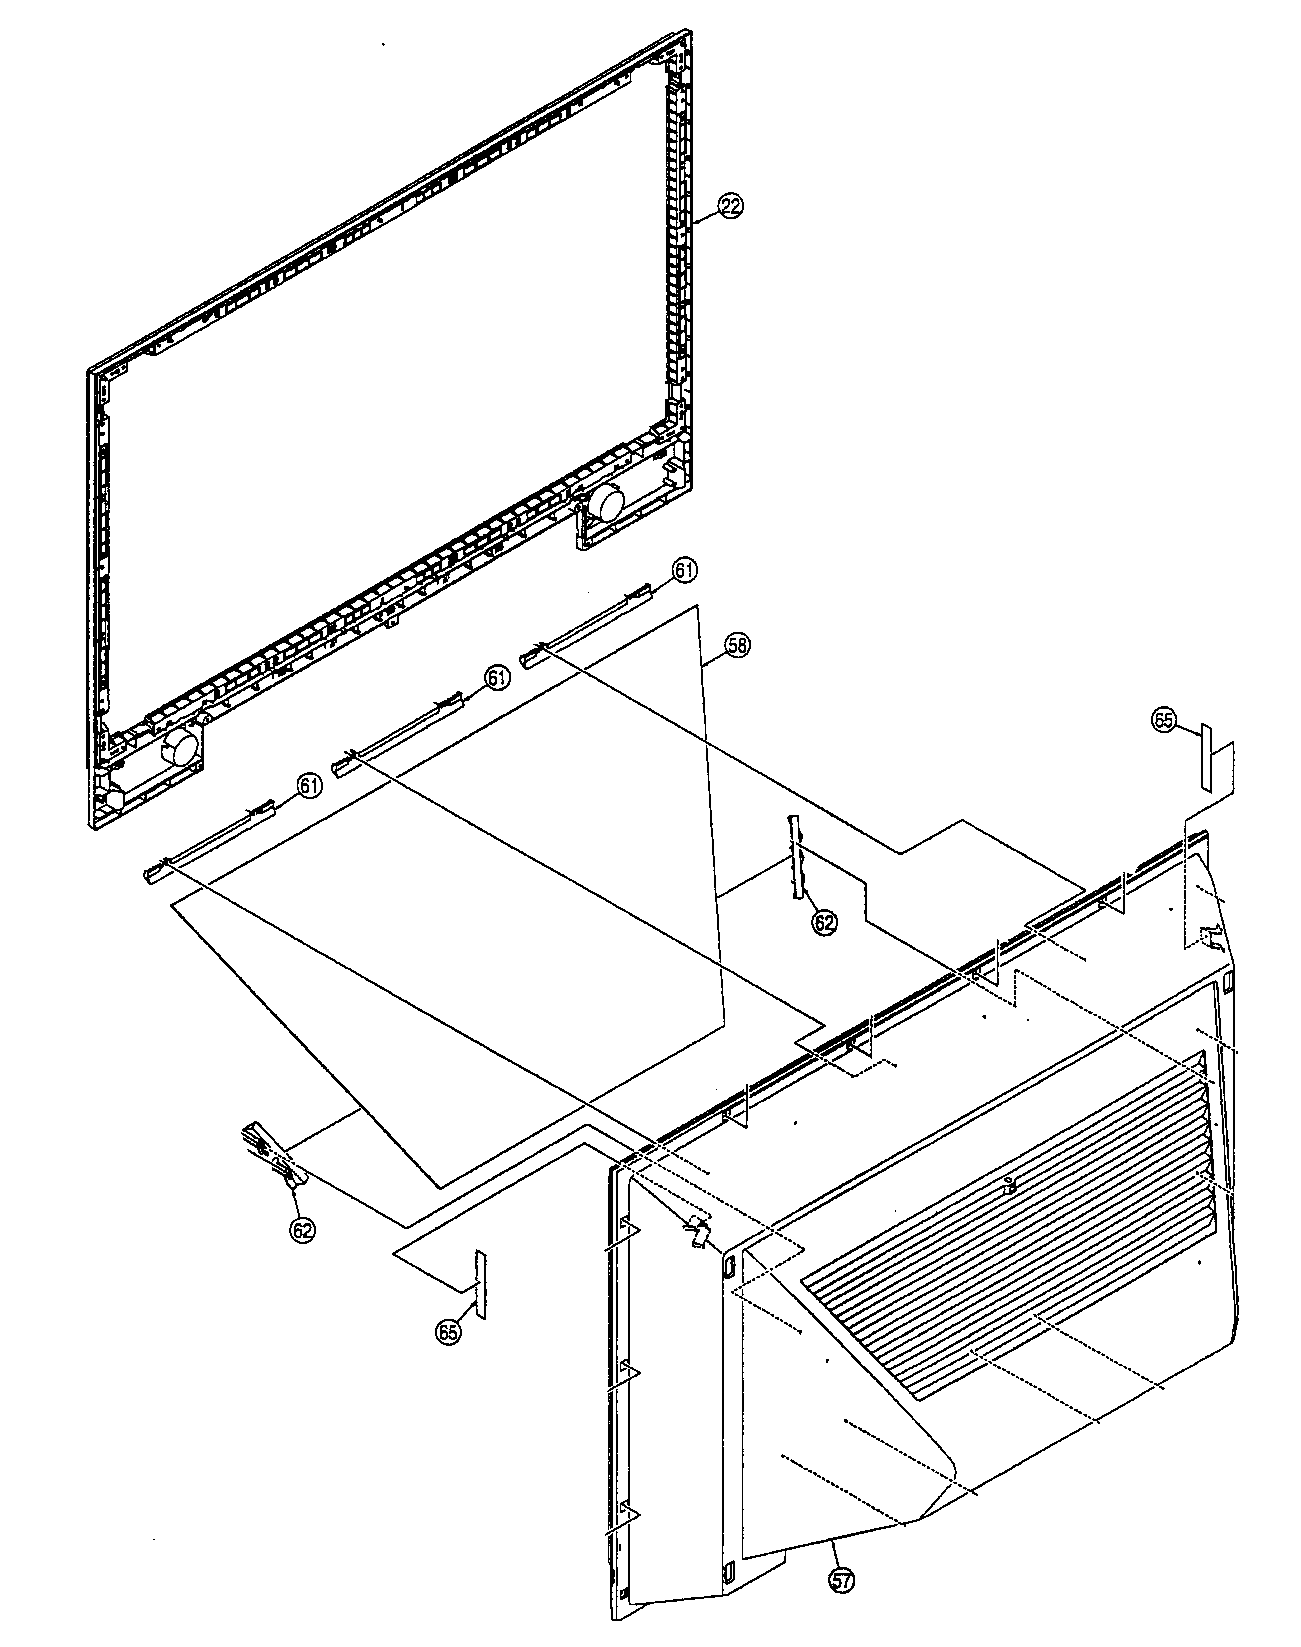 Panasonic model PT-61LCZ70 lcd television genuine parts